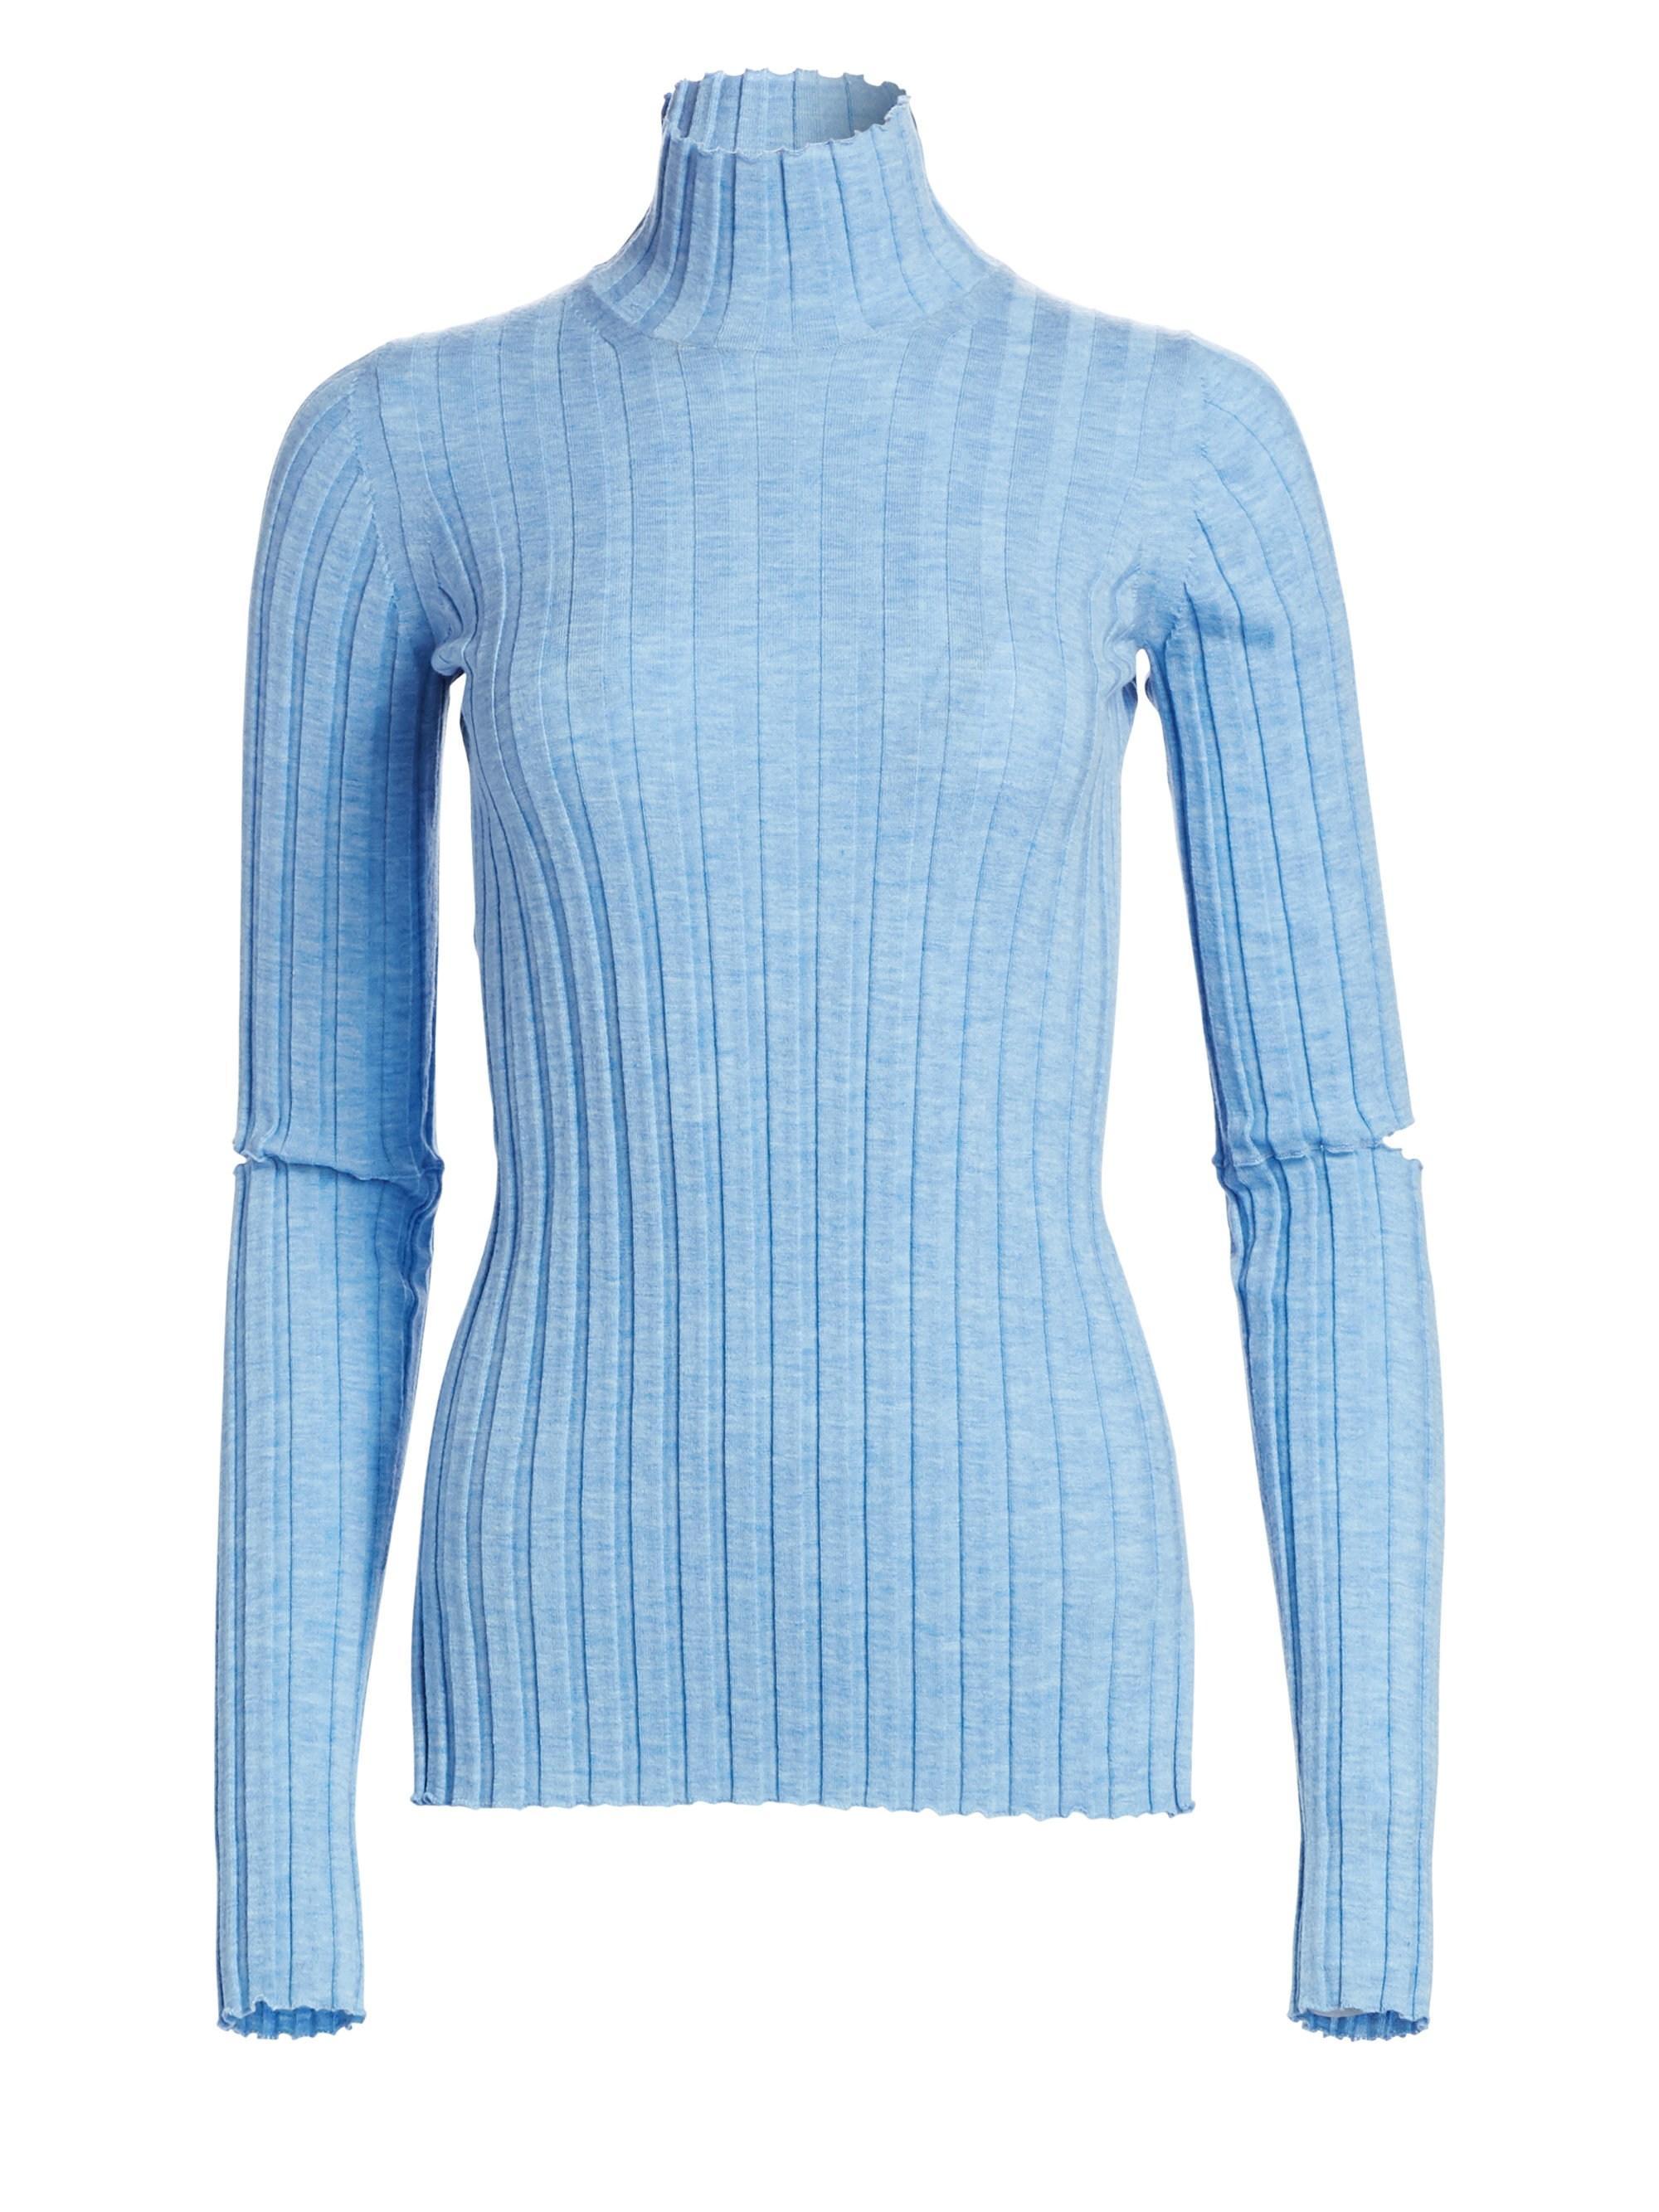 d7161f3c8 Helmut Lang Women s Wool Slash Turtleneck Sweater - Light Blue ...